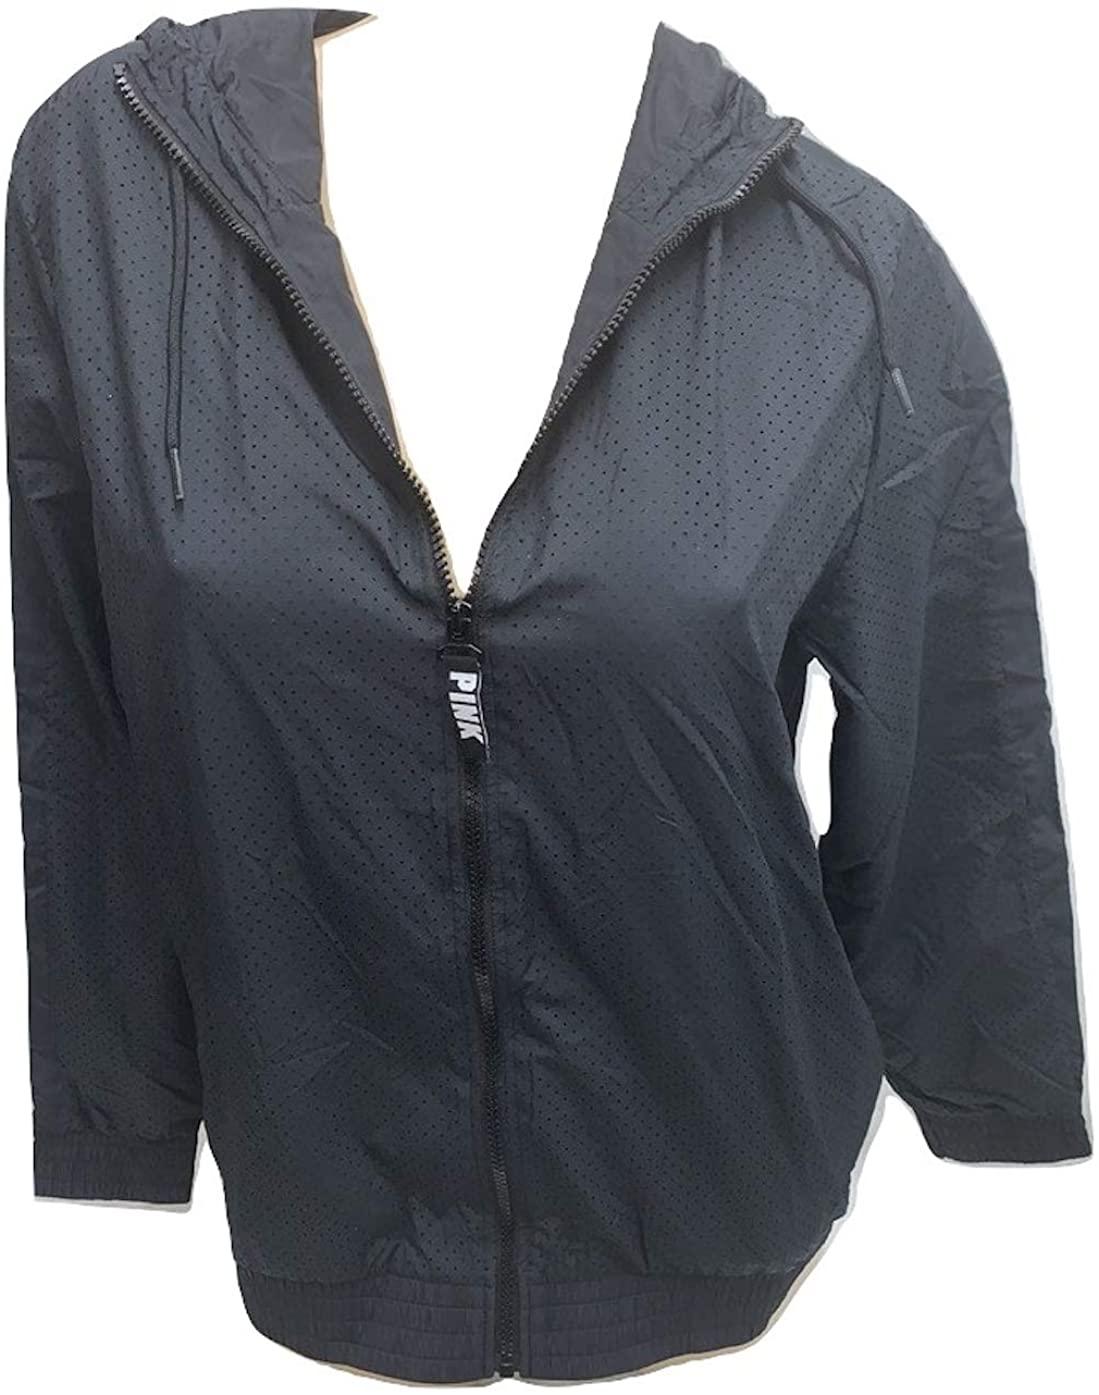 Pink Anorak Windbreaker Jacket Full Zip Color Black Size XSmall/Small NWT